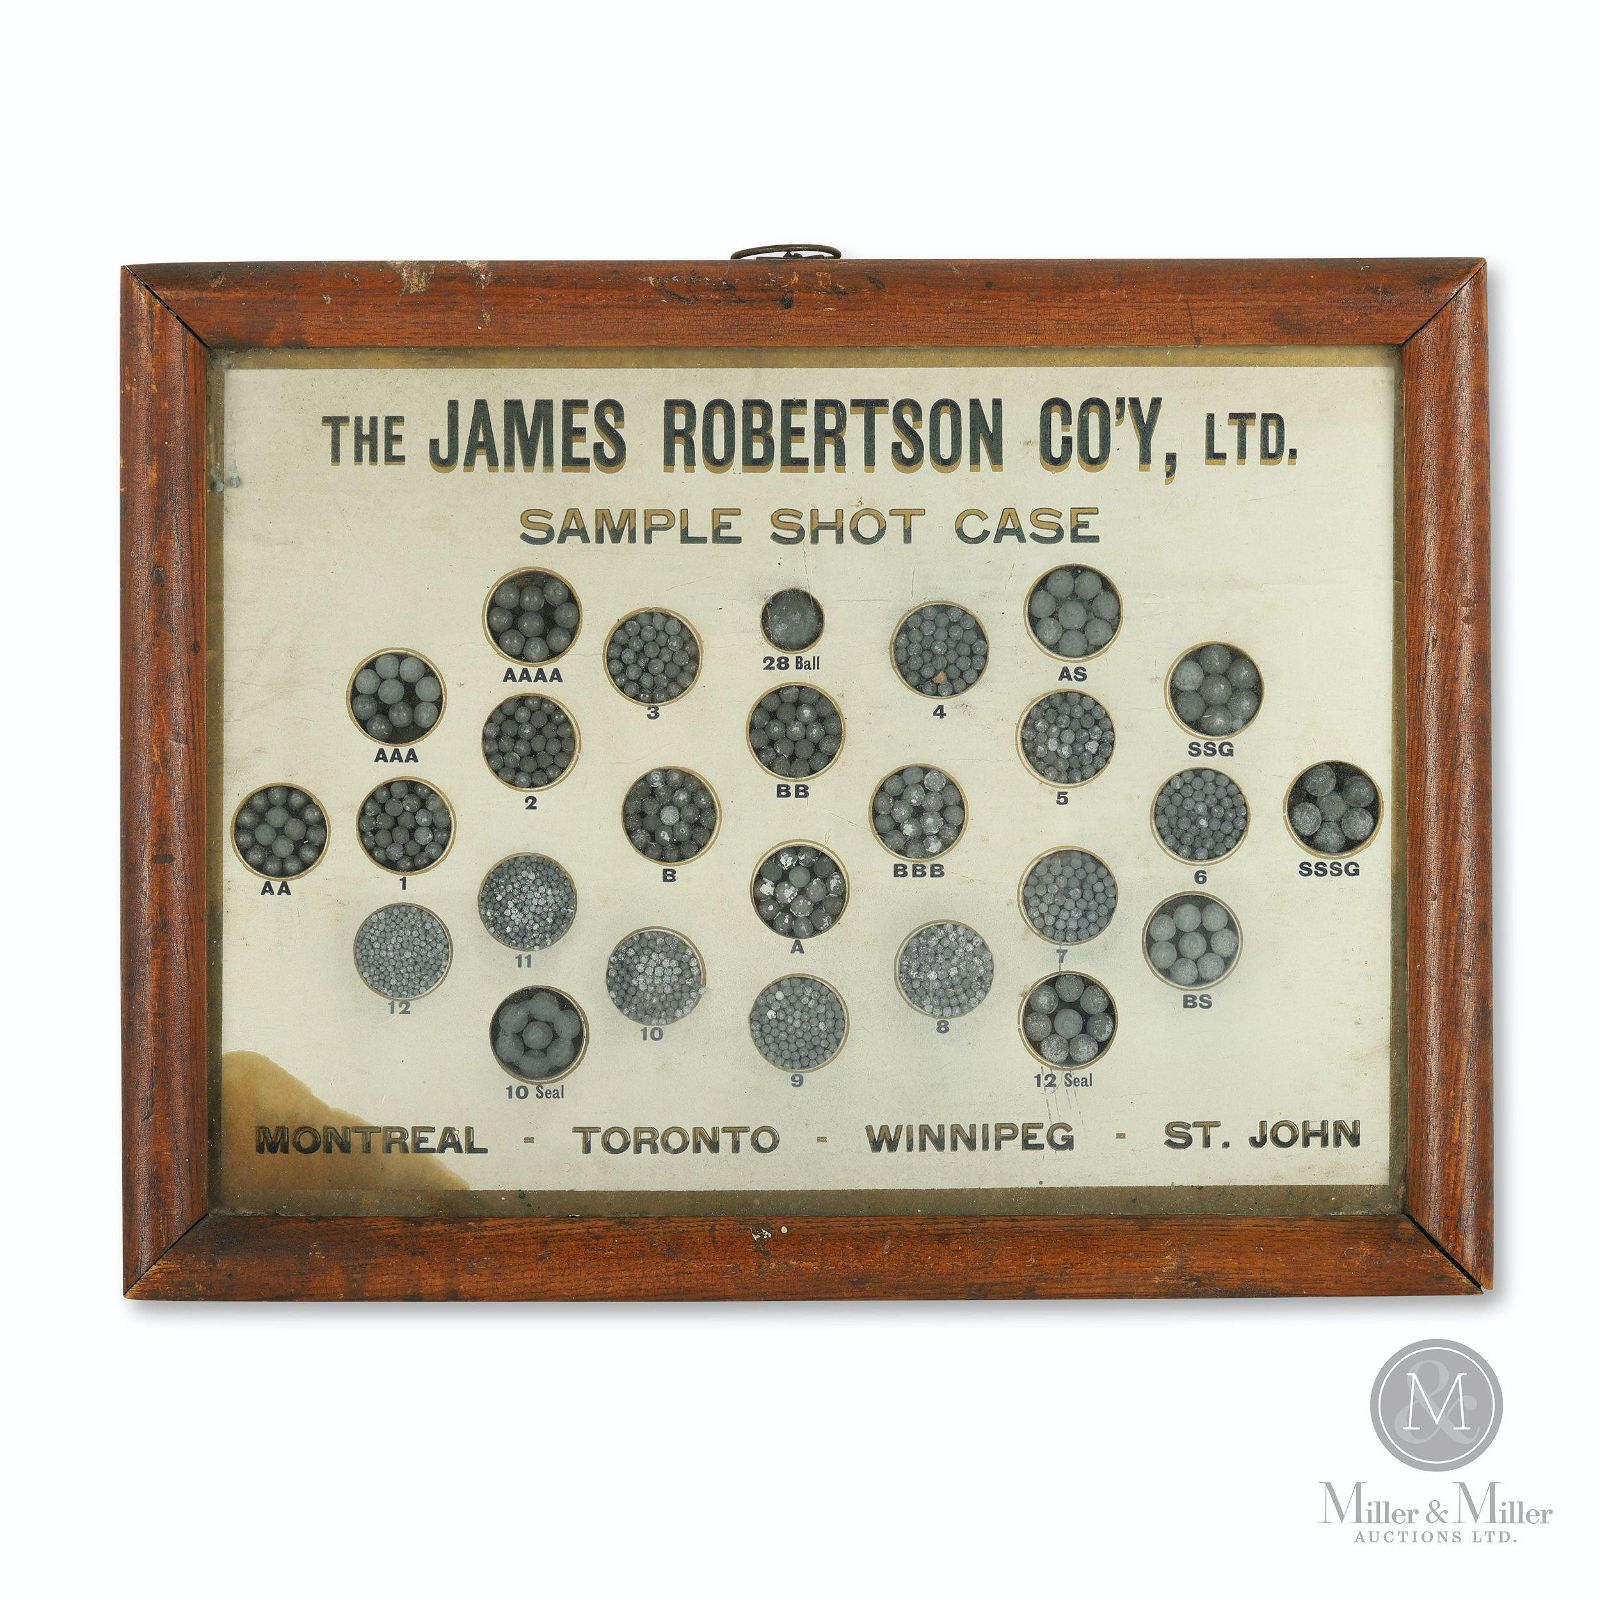 James Robertson Co., Toronto Sample Shot Case